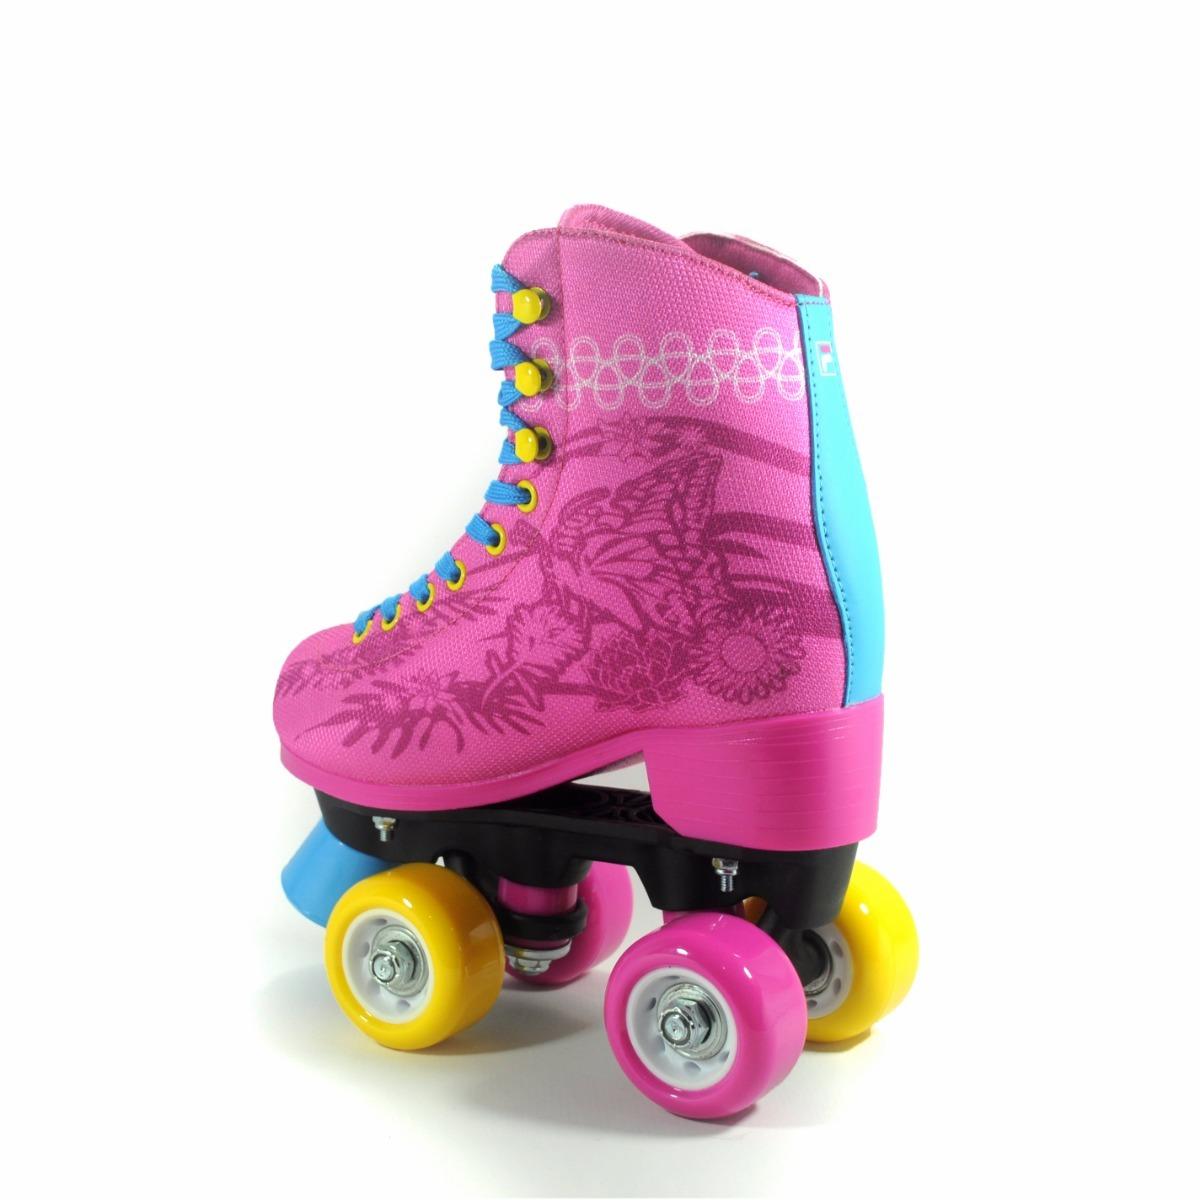 1407cbd94 patins rosa quad fila juliet - infantil - roller. Carregando zoom.